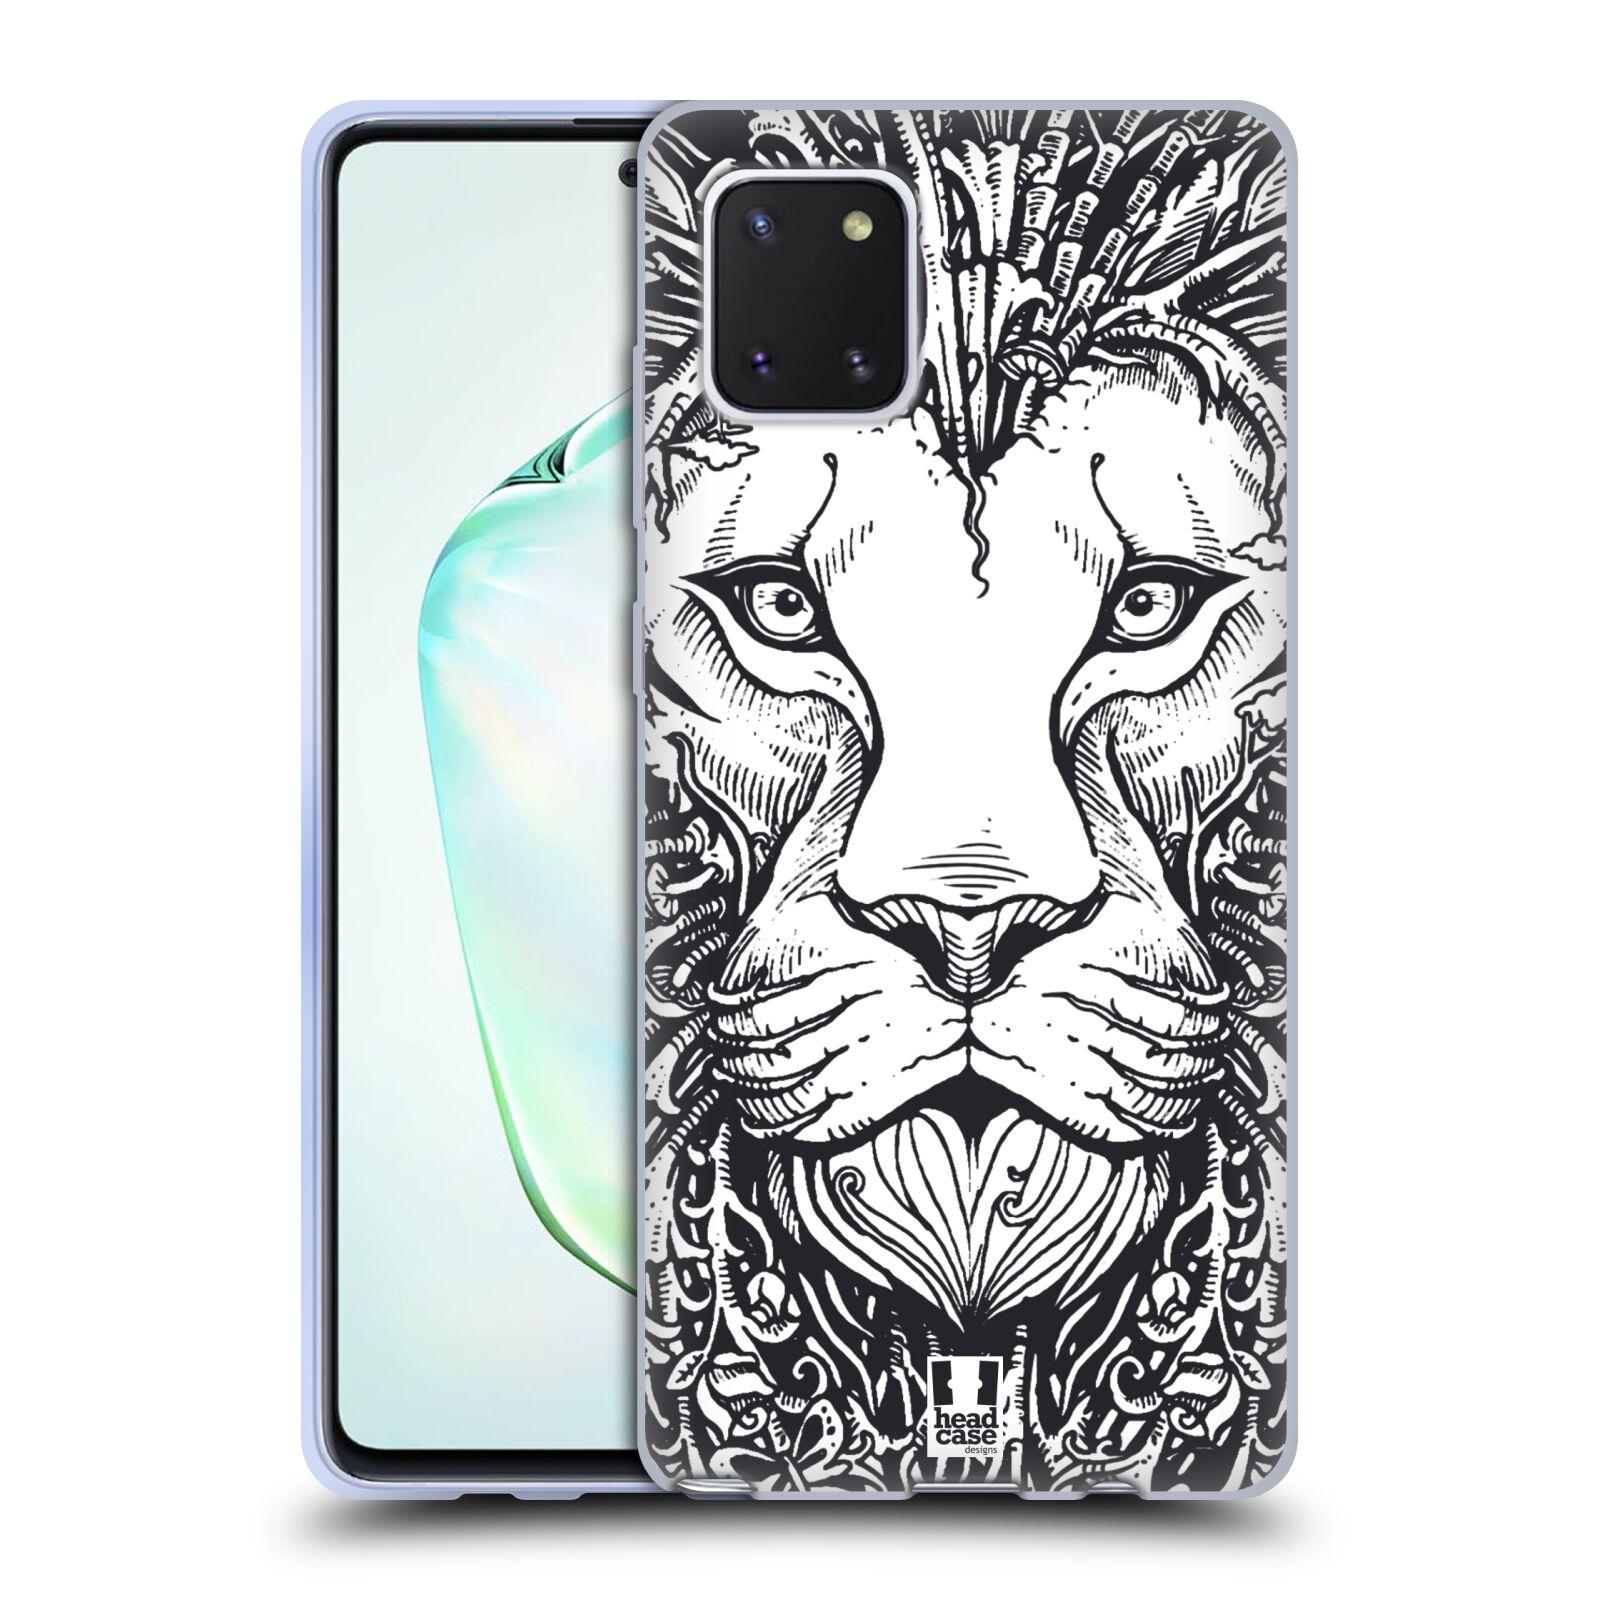 Silikonové pouzdro na mobil Samsung Galaxy Note 10 Lite - Head Case - DOODLE TVÁŘ LEV